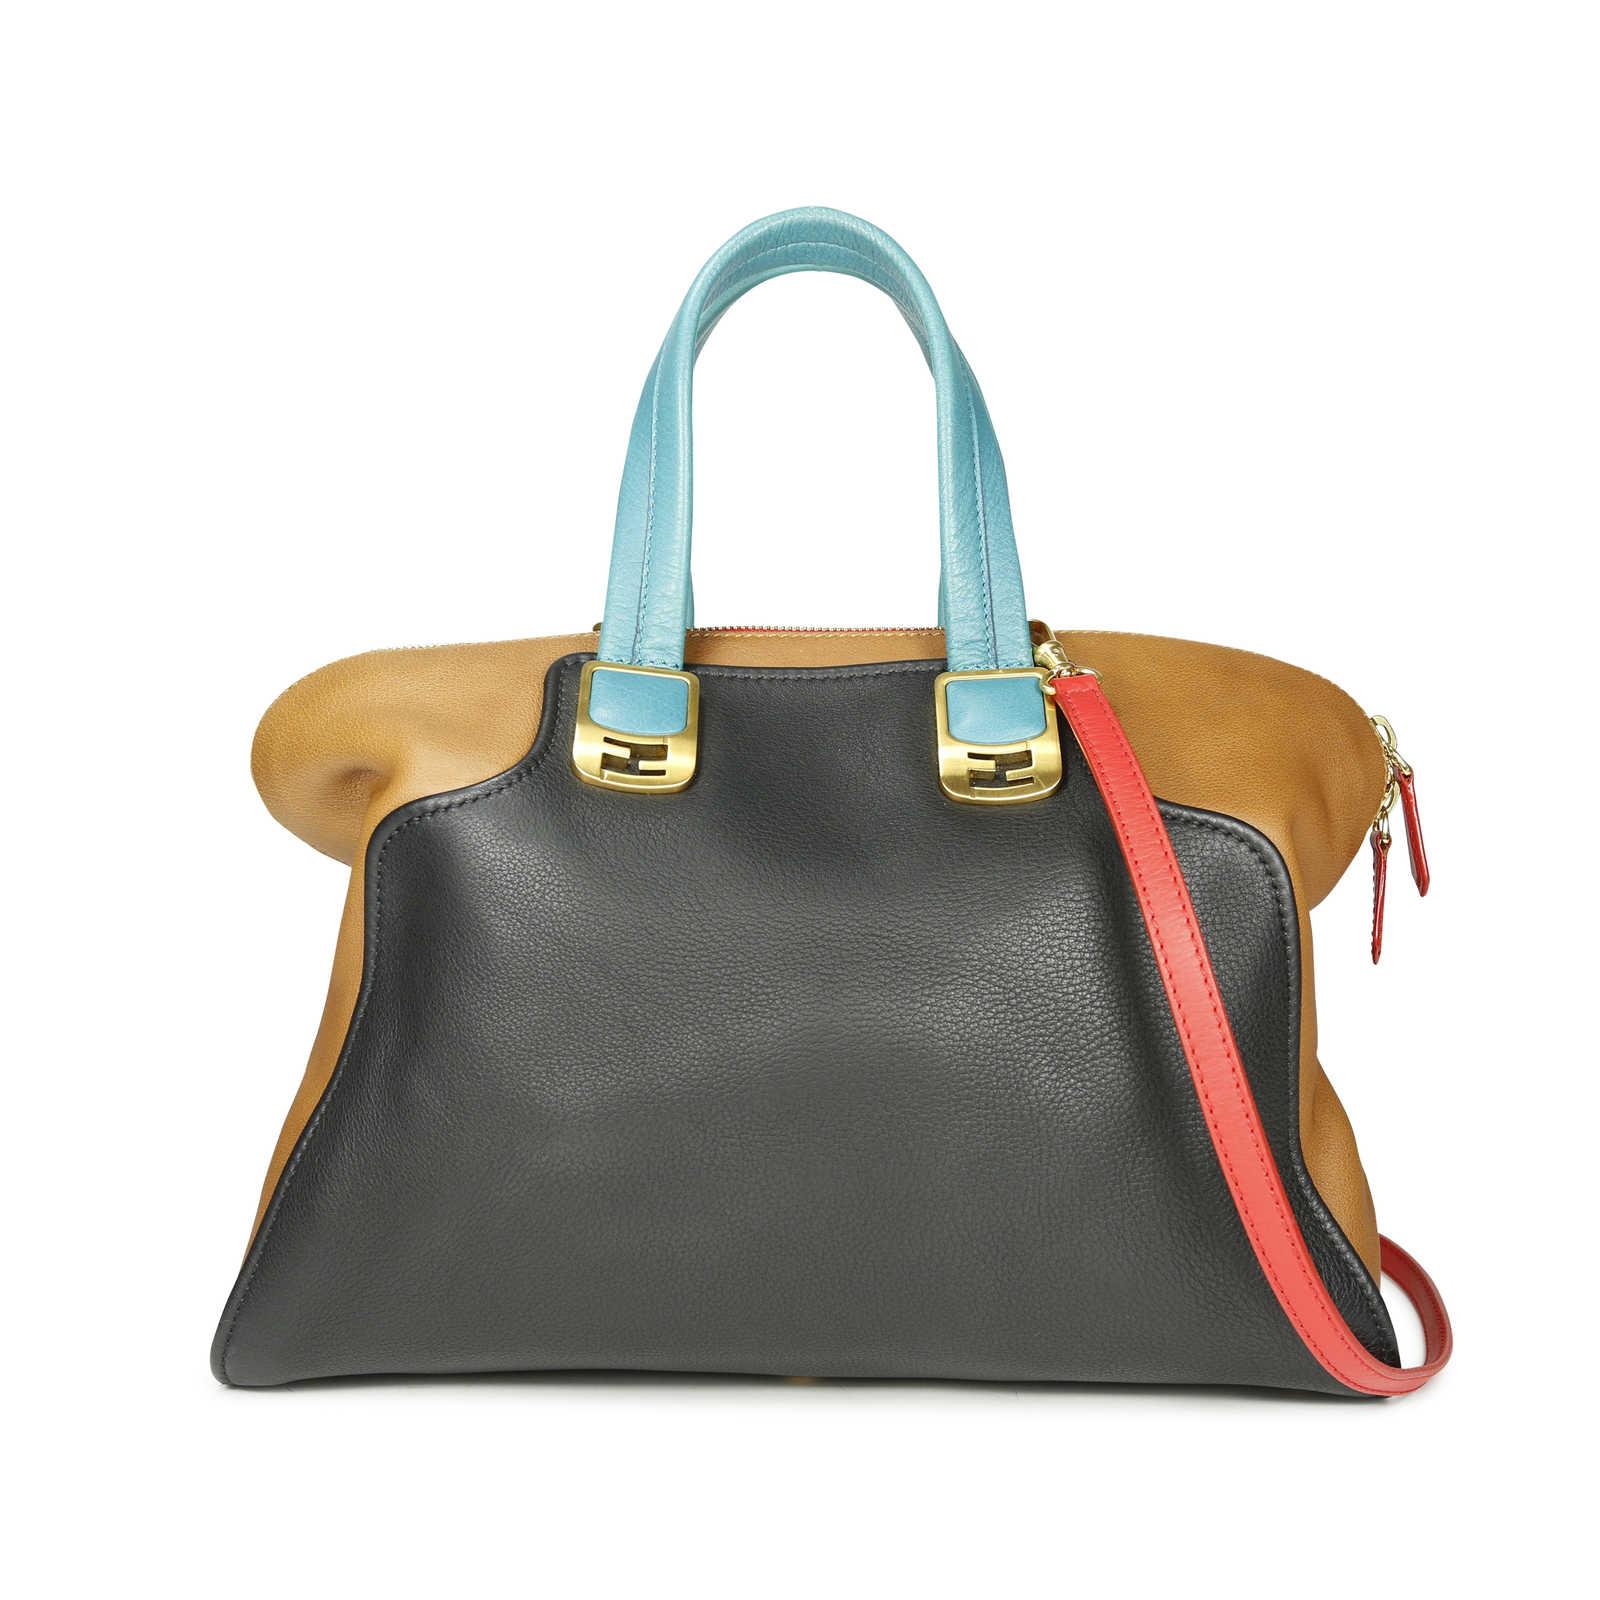 Authentic Pre Owned Fendi Large Chameleon Bag Pss 145 00067 Thumbnail